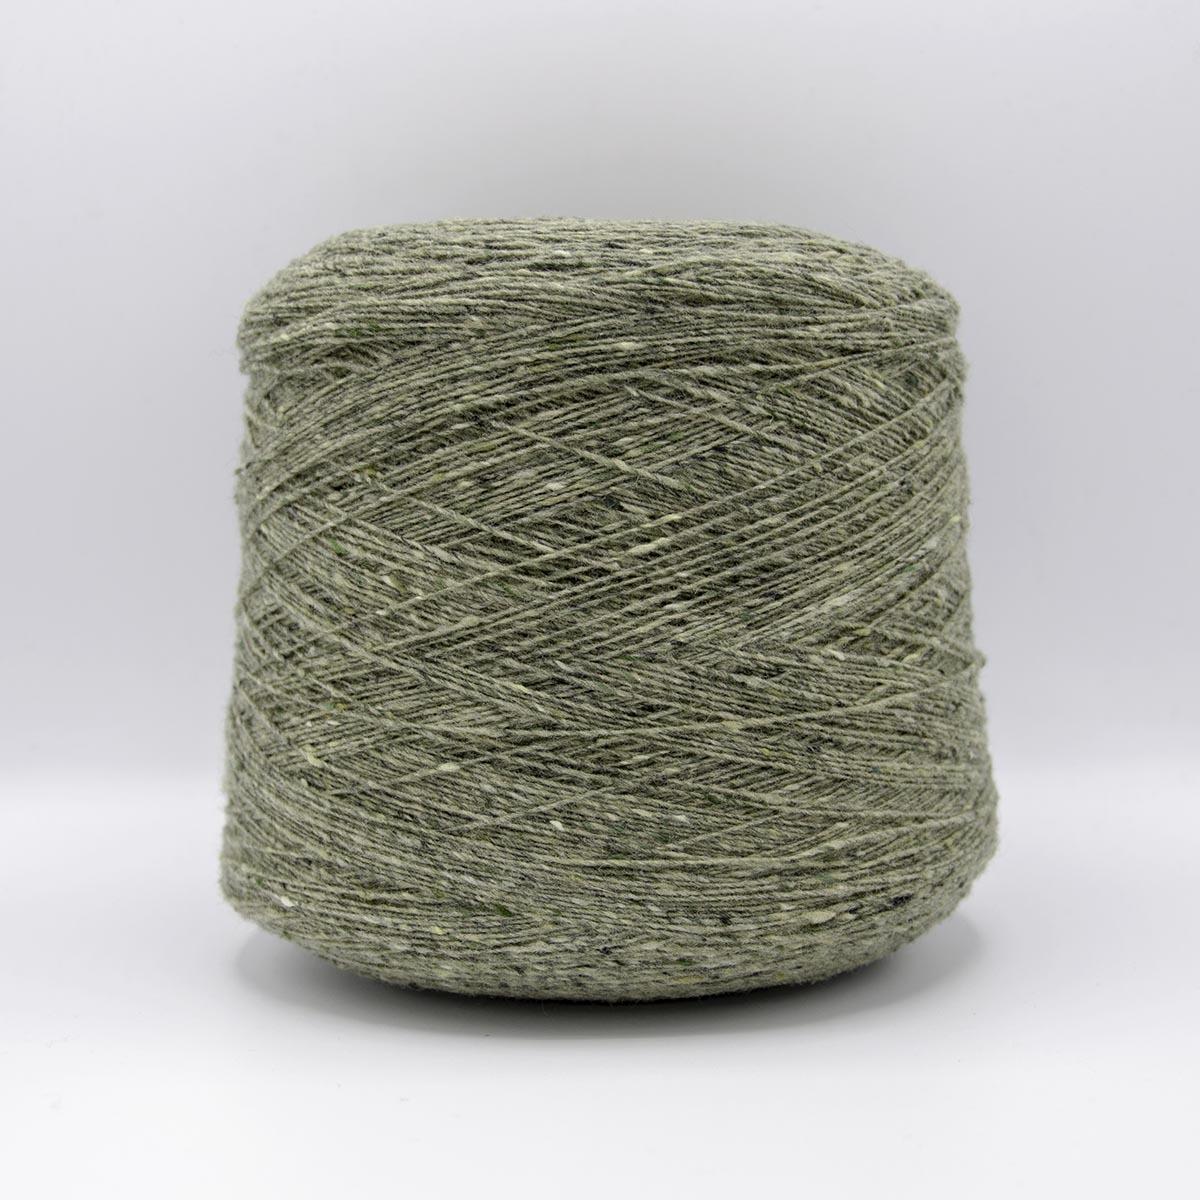 Knoll Yarns Soft Donegal (одинарный твид) - 5523